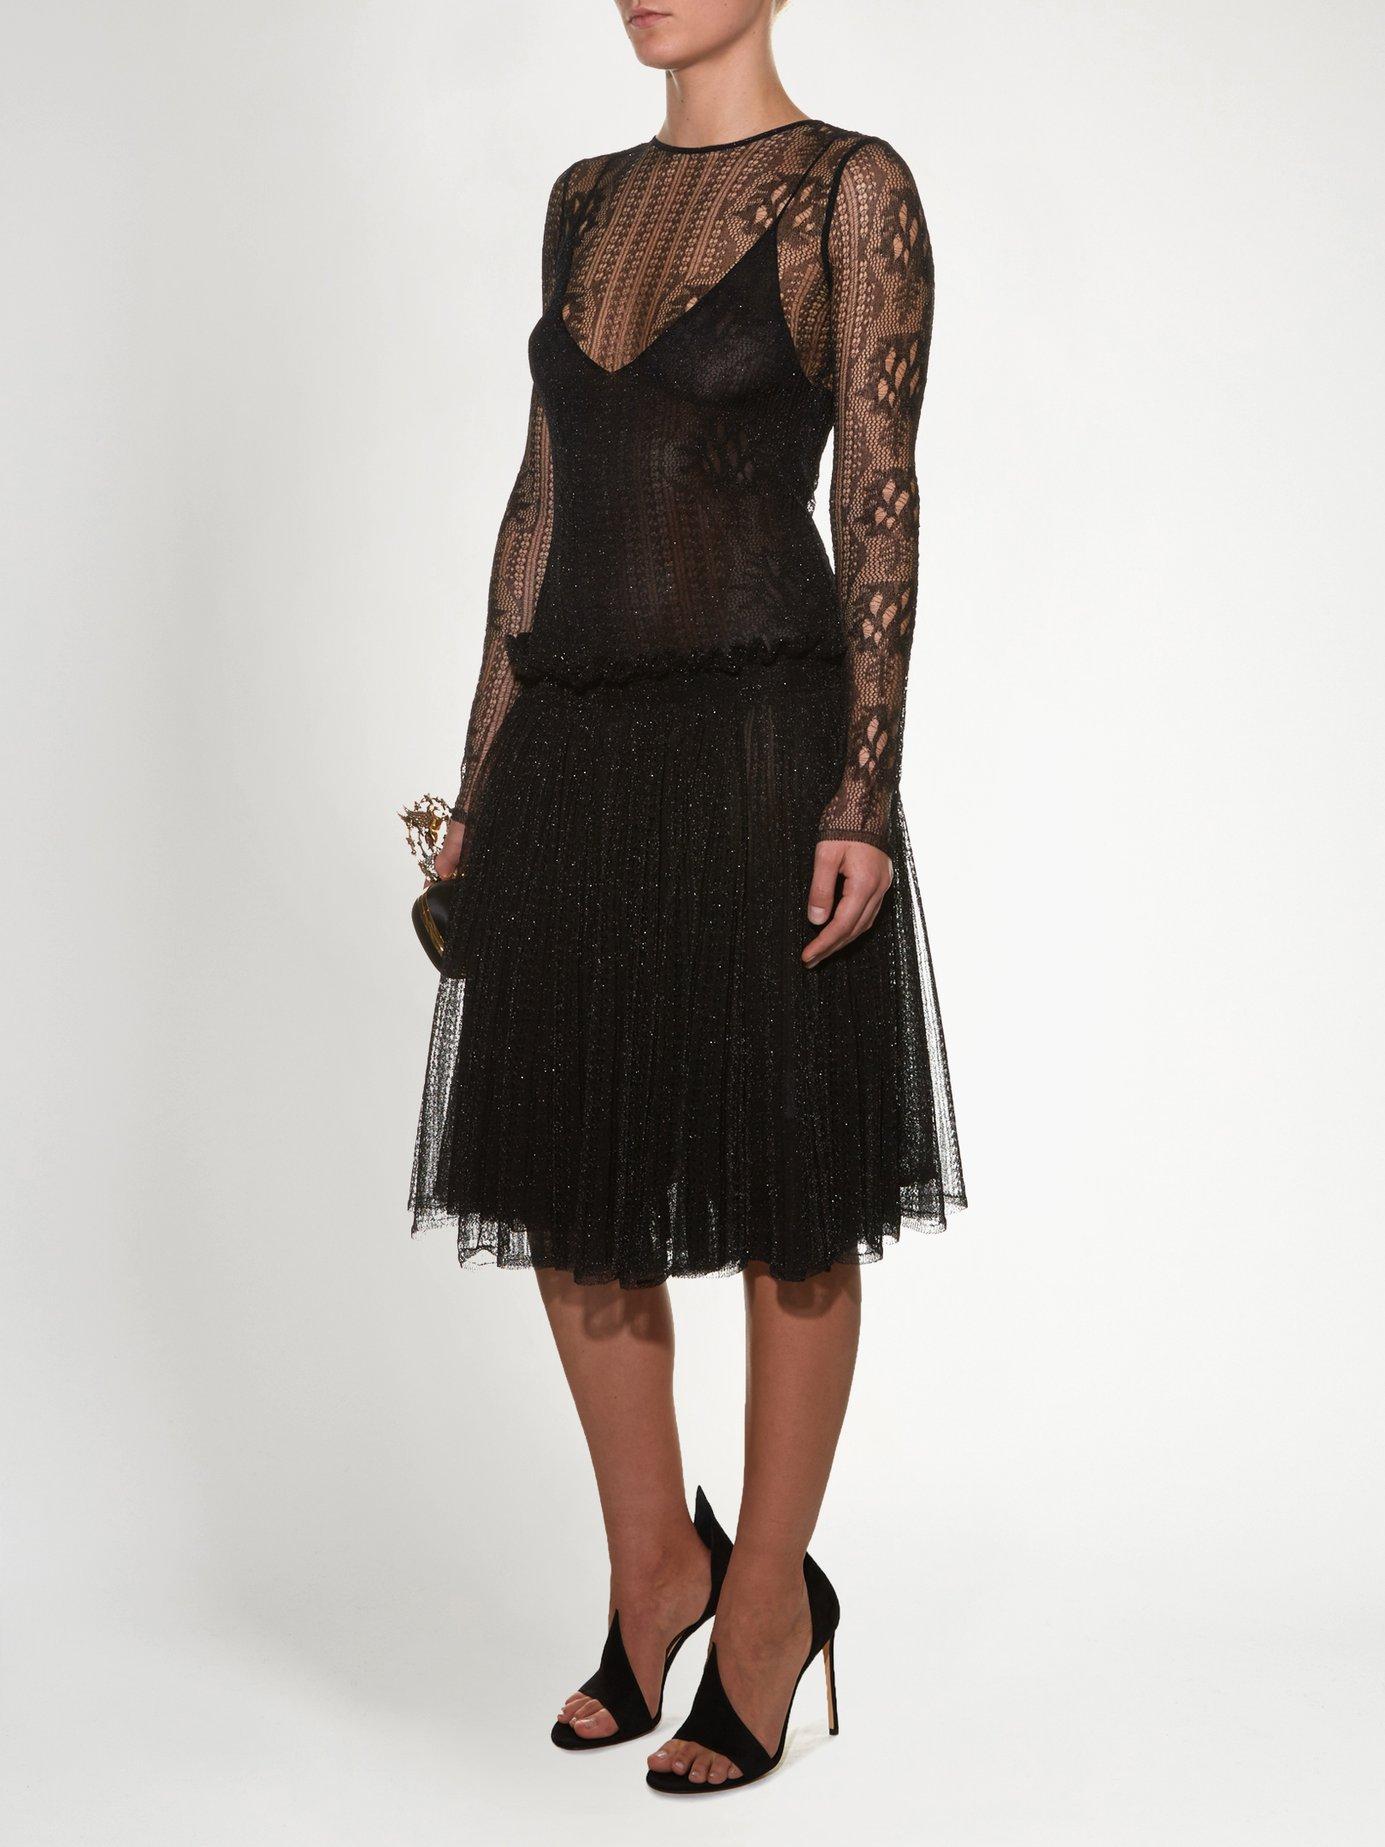 Dropped-waist lace dress by Alexander Mcqueen